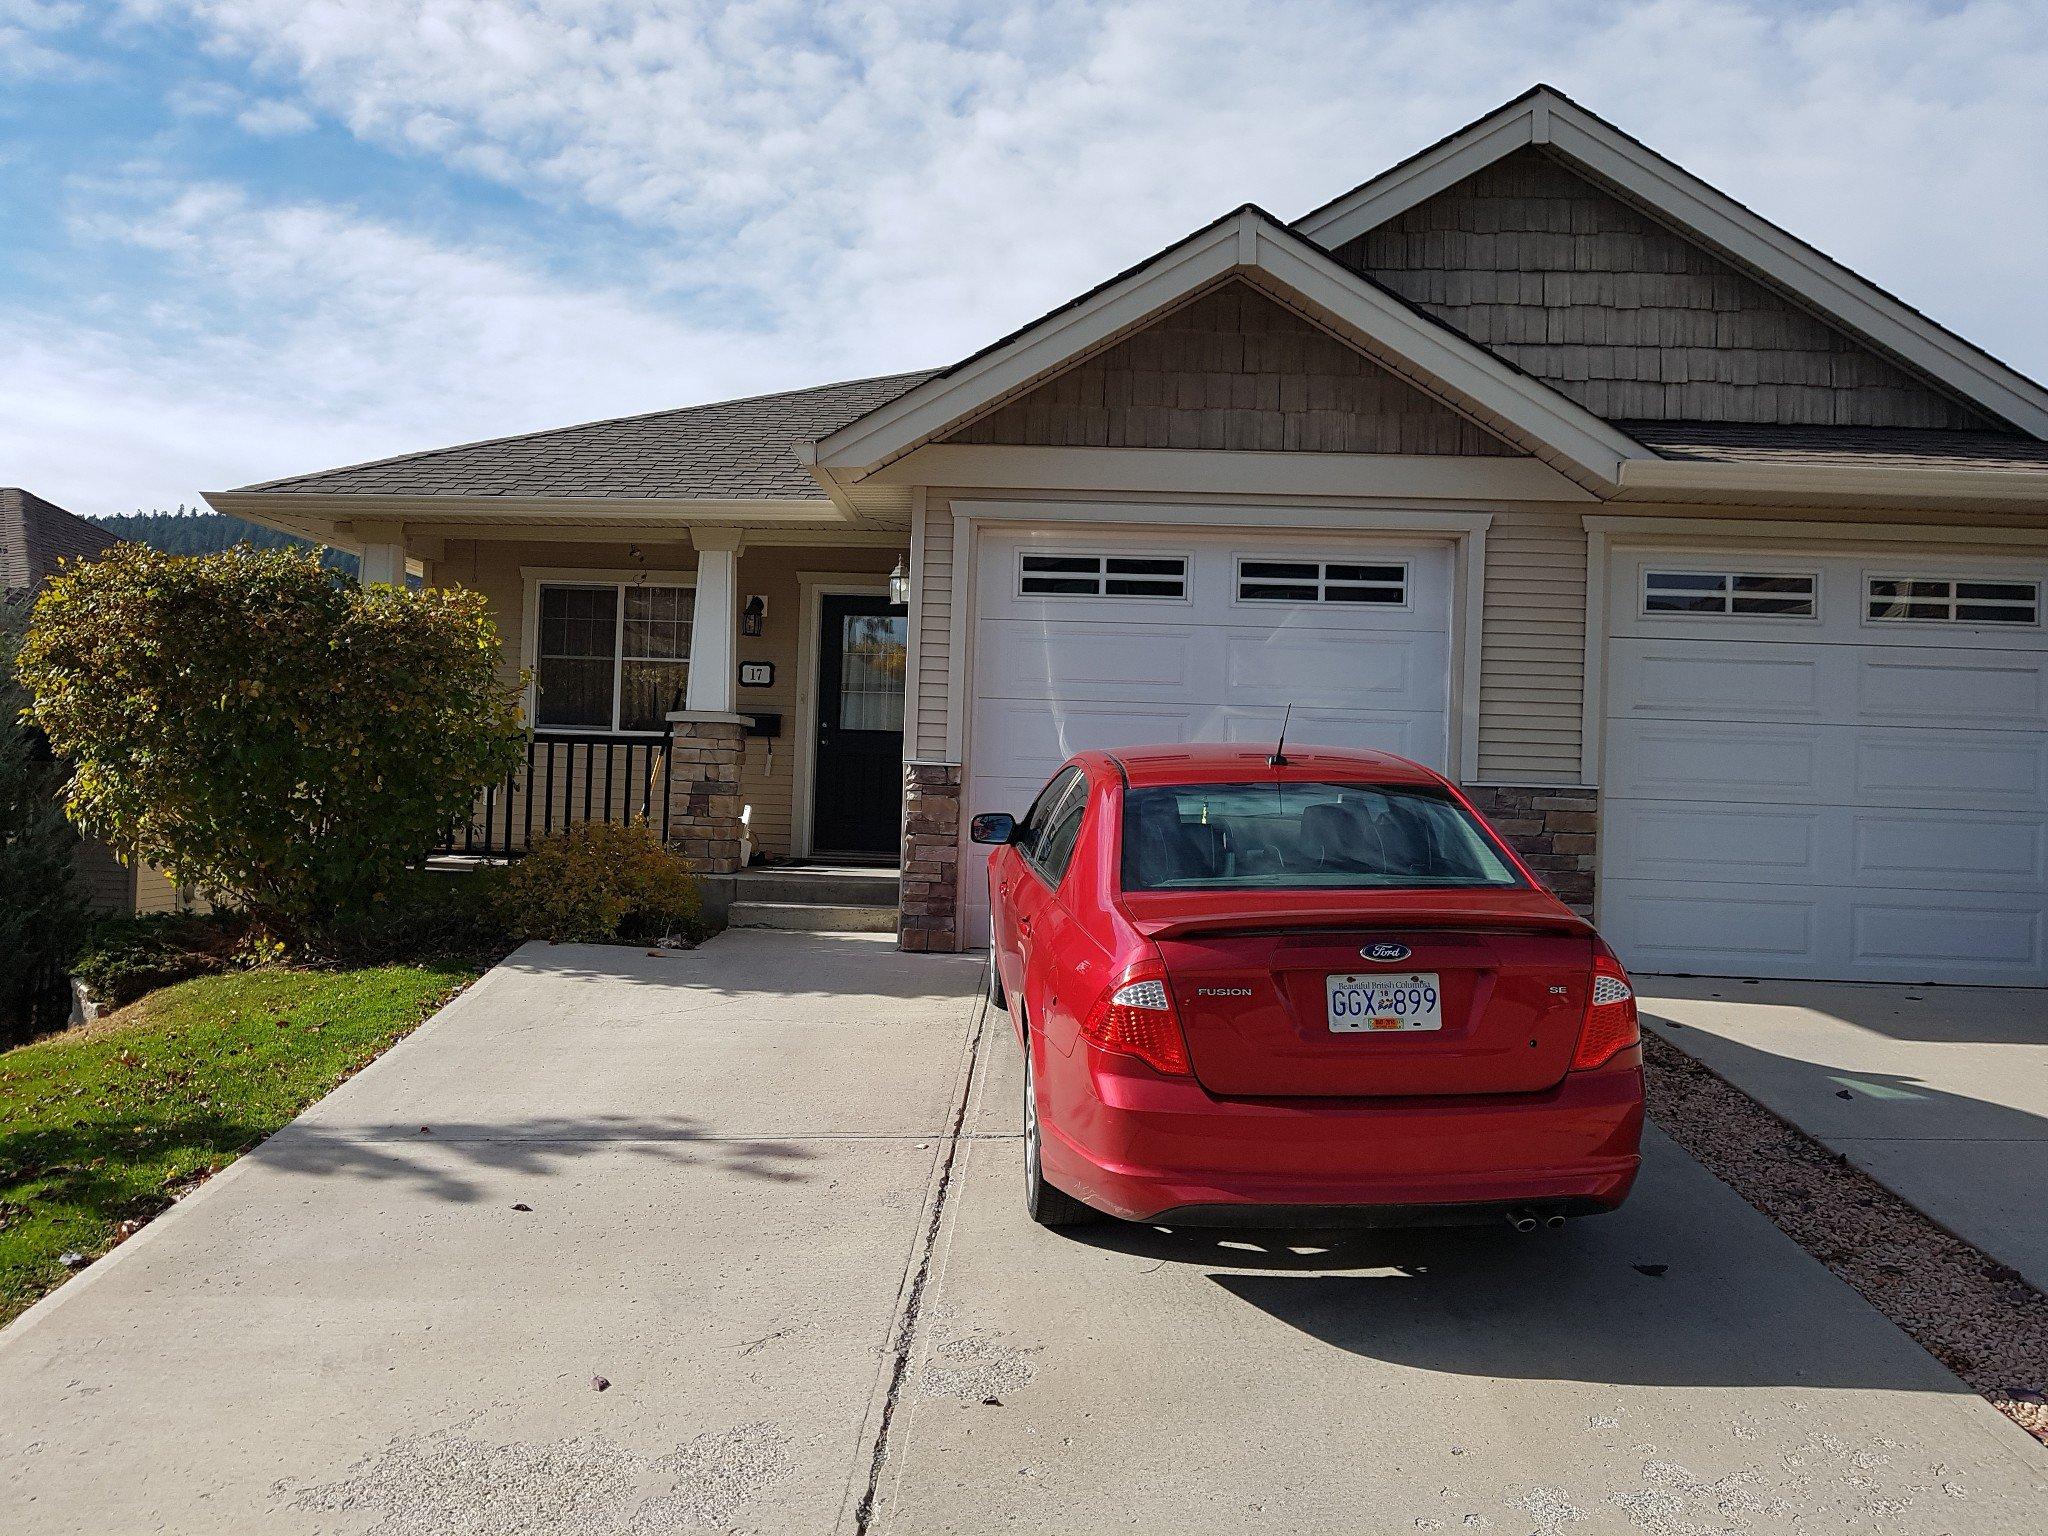 Main Photo: 17 1940 HILLSIDE DR in KAMLOOPS: MT DUFFERIN House 1/2 Duplex for sale : MLS®# 146436